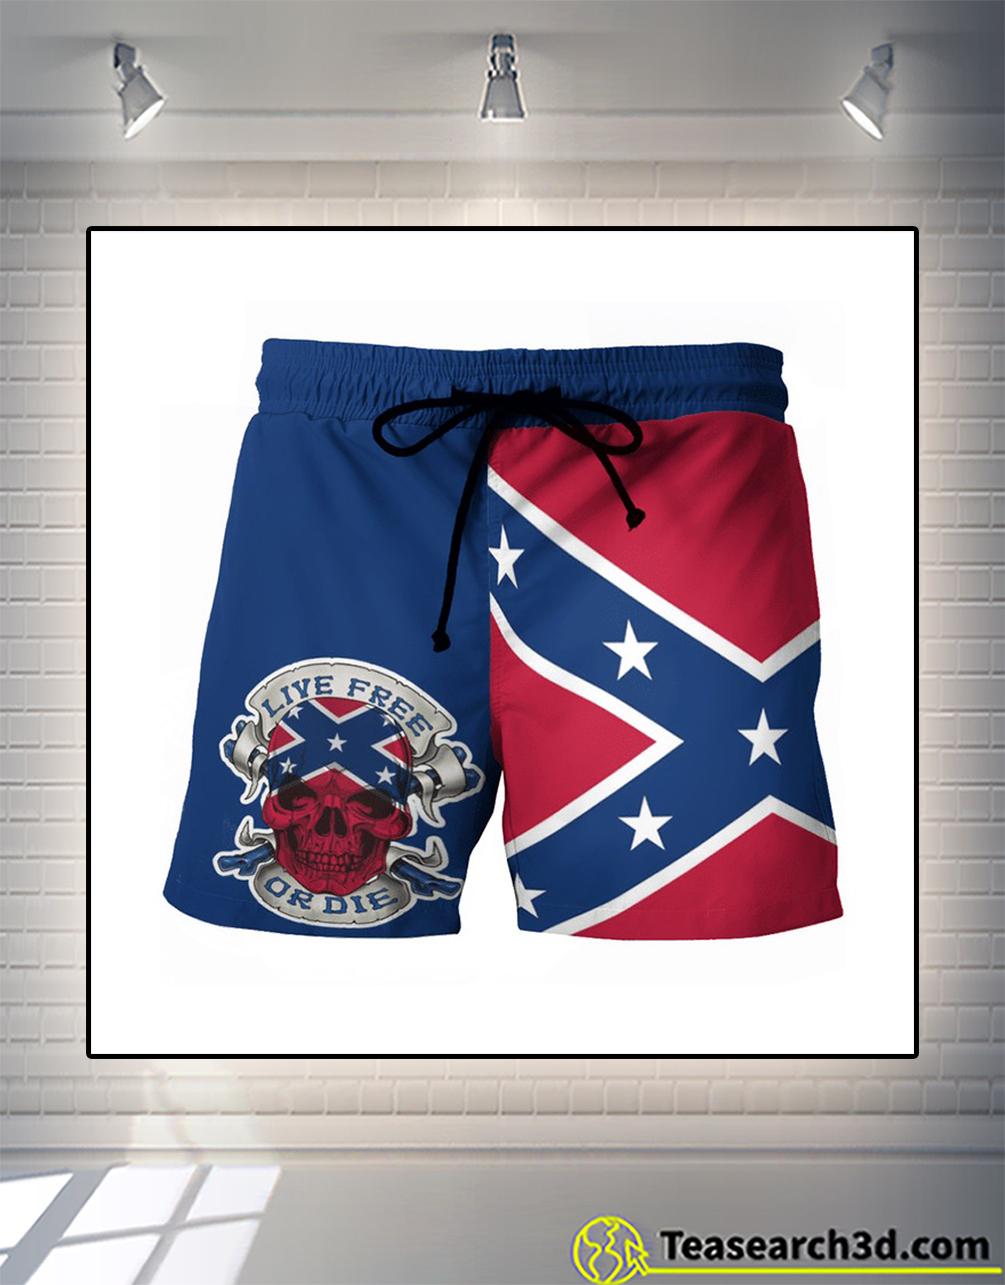 Live free or die american beach shorts